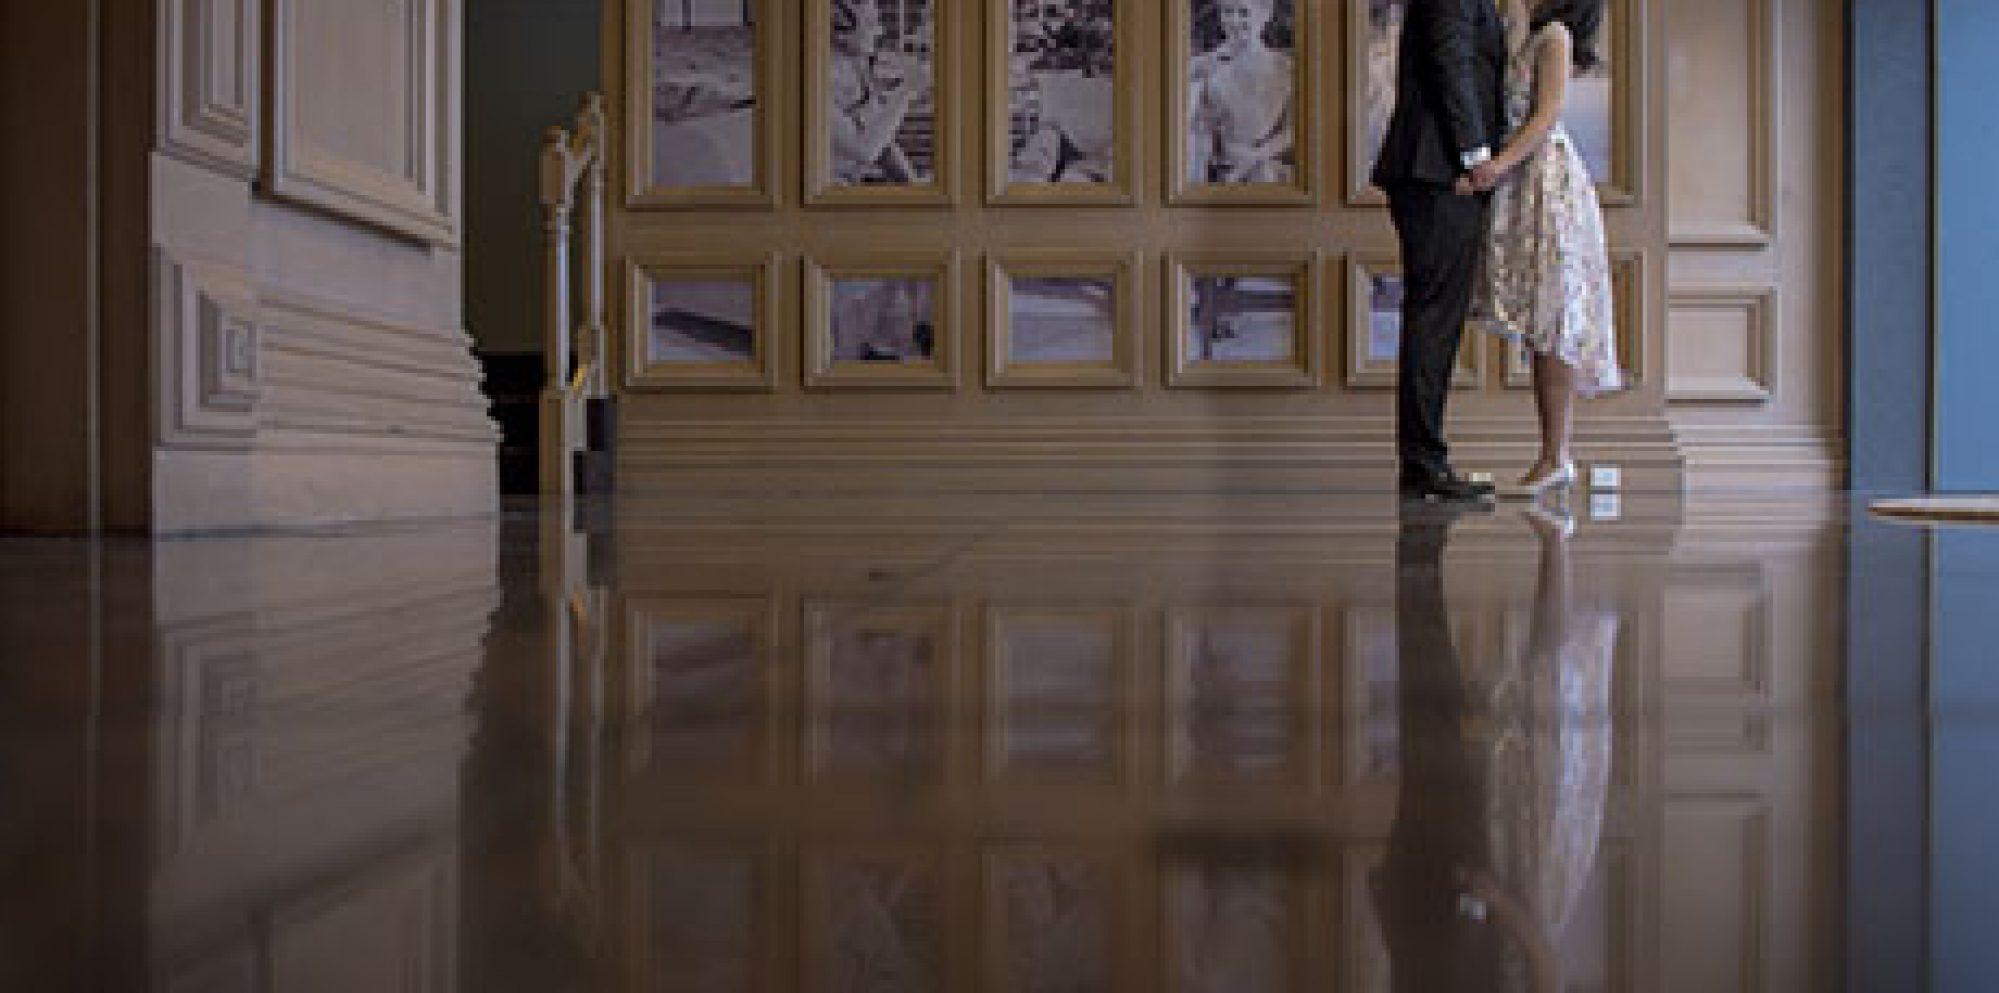 Oscar and yuki brighton savoy hotel wedding video